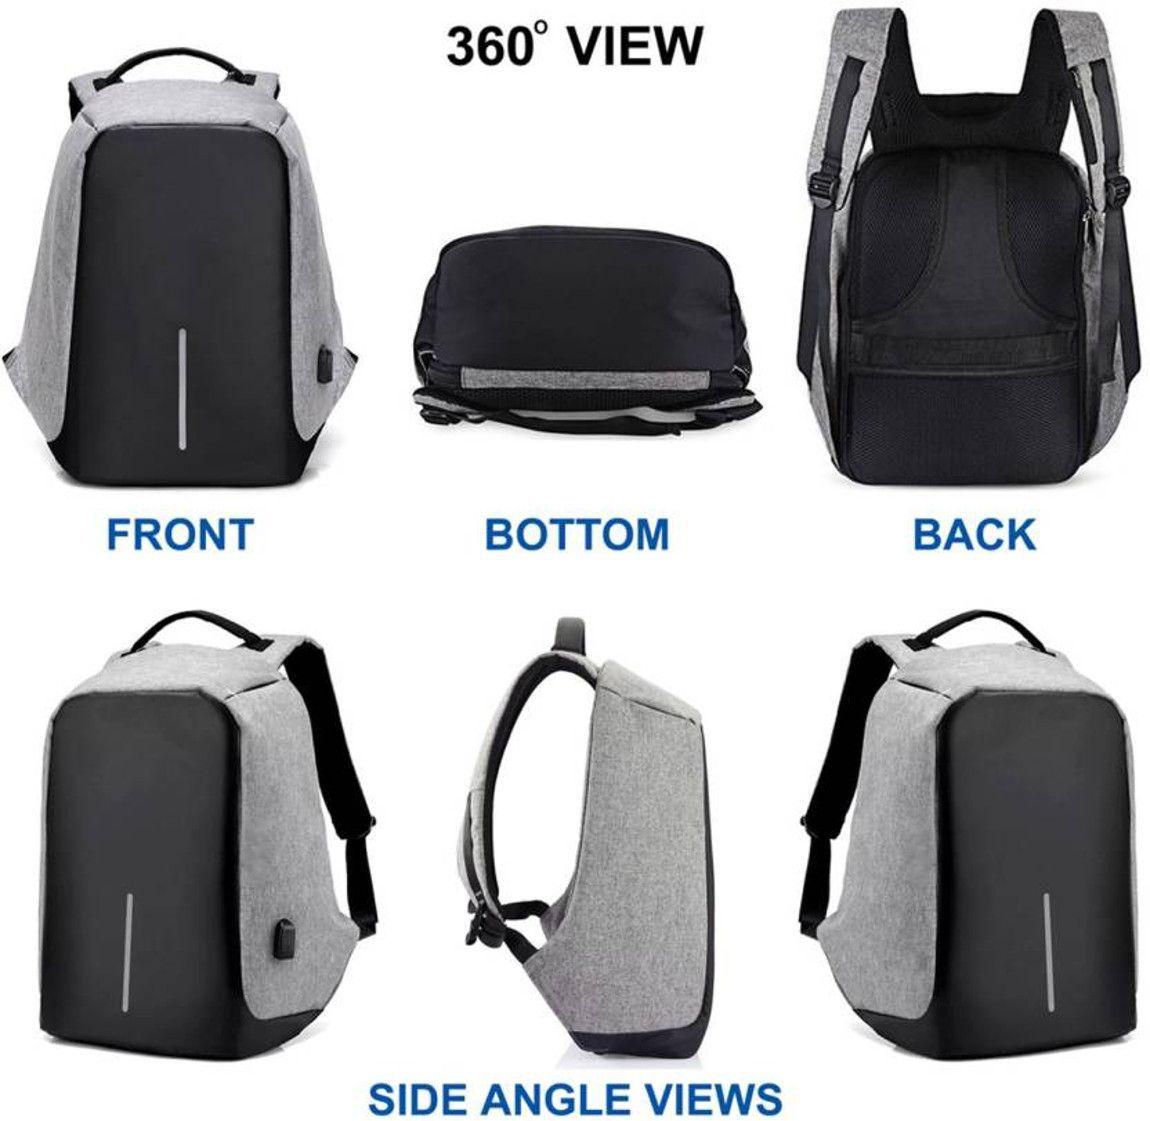 accf714cc947 ... NP NAVEEN PLASTIC 16 Inch Fit Laptop Waterproof School Bag   College  Backpack